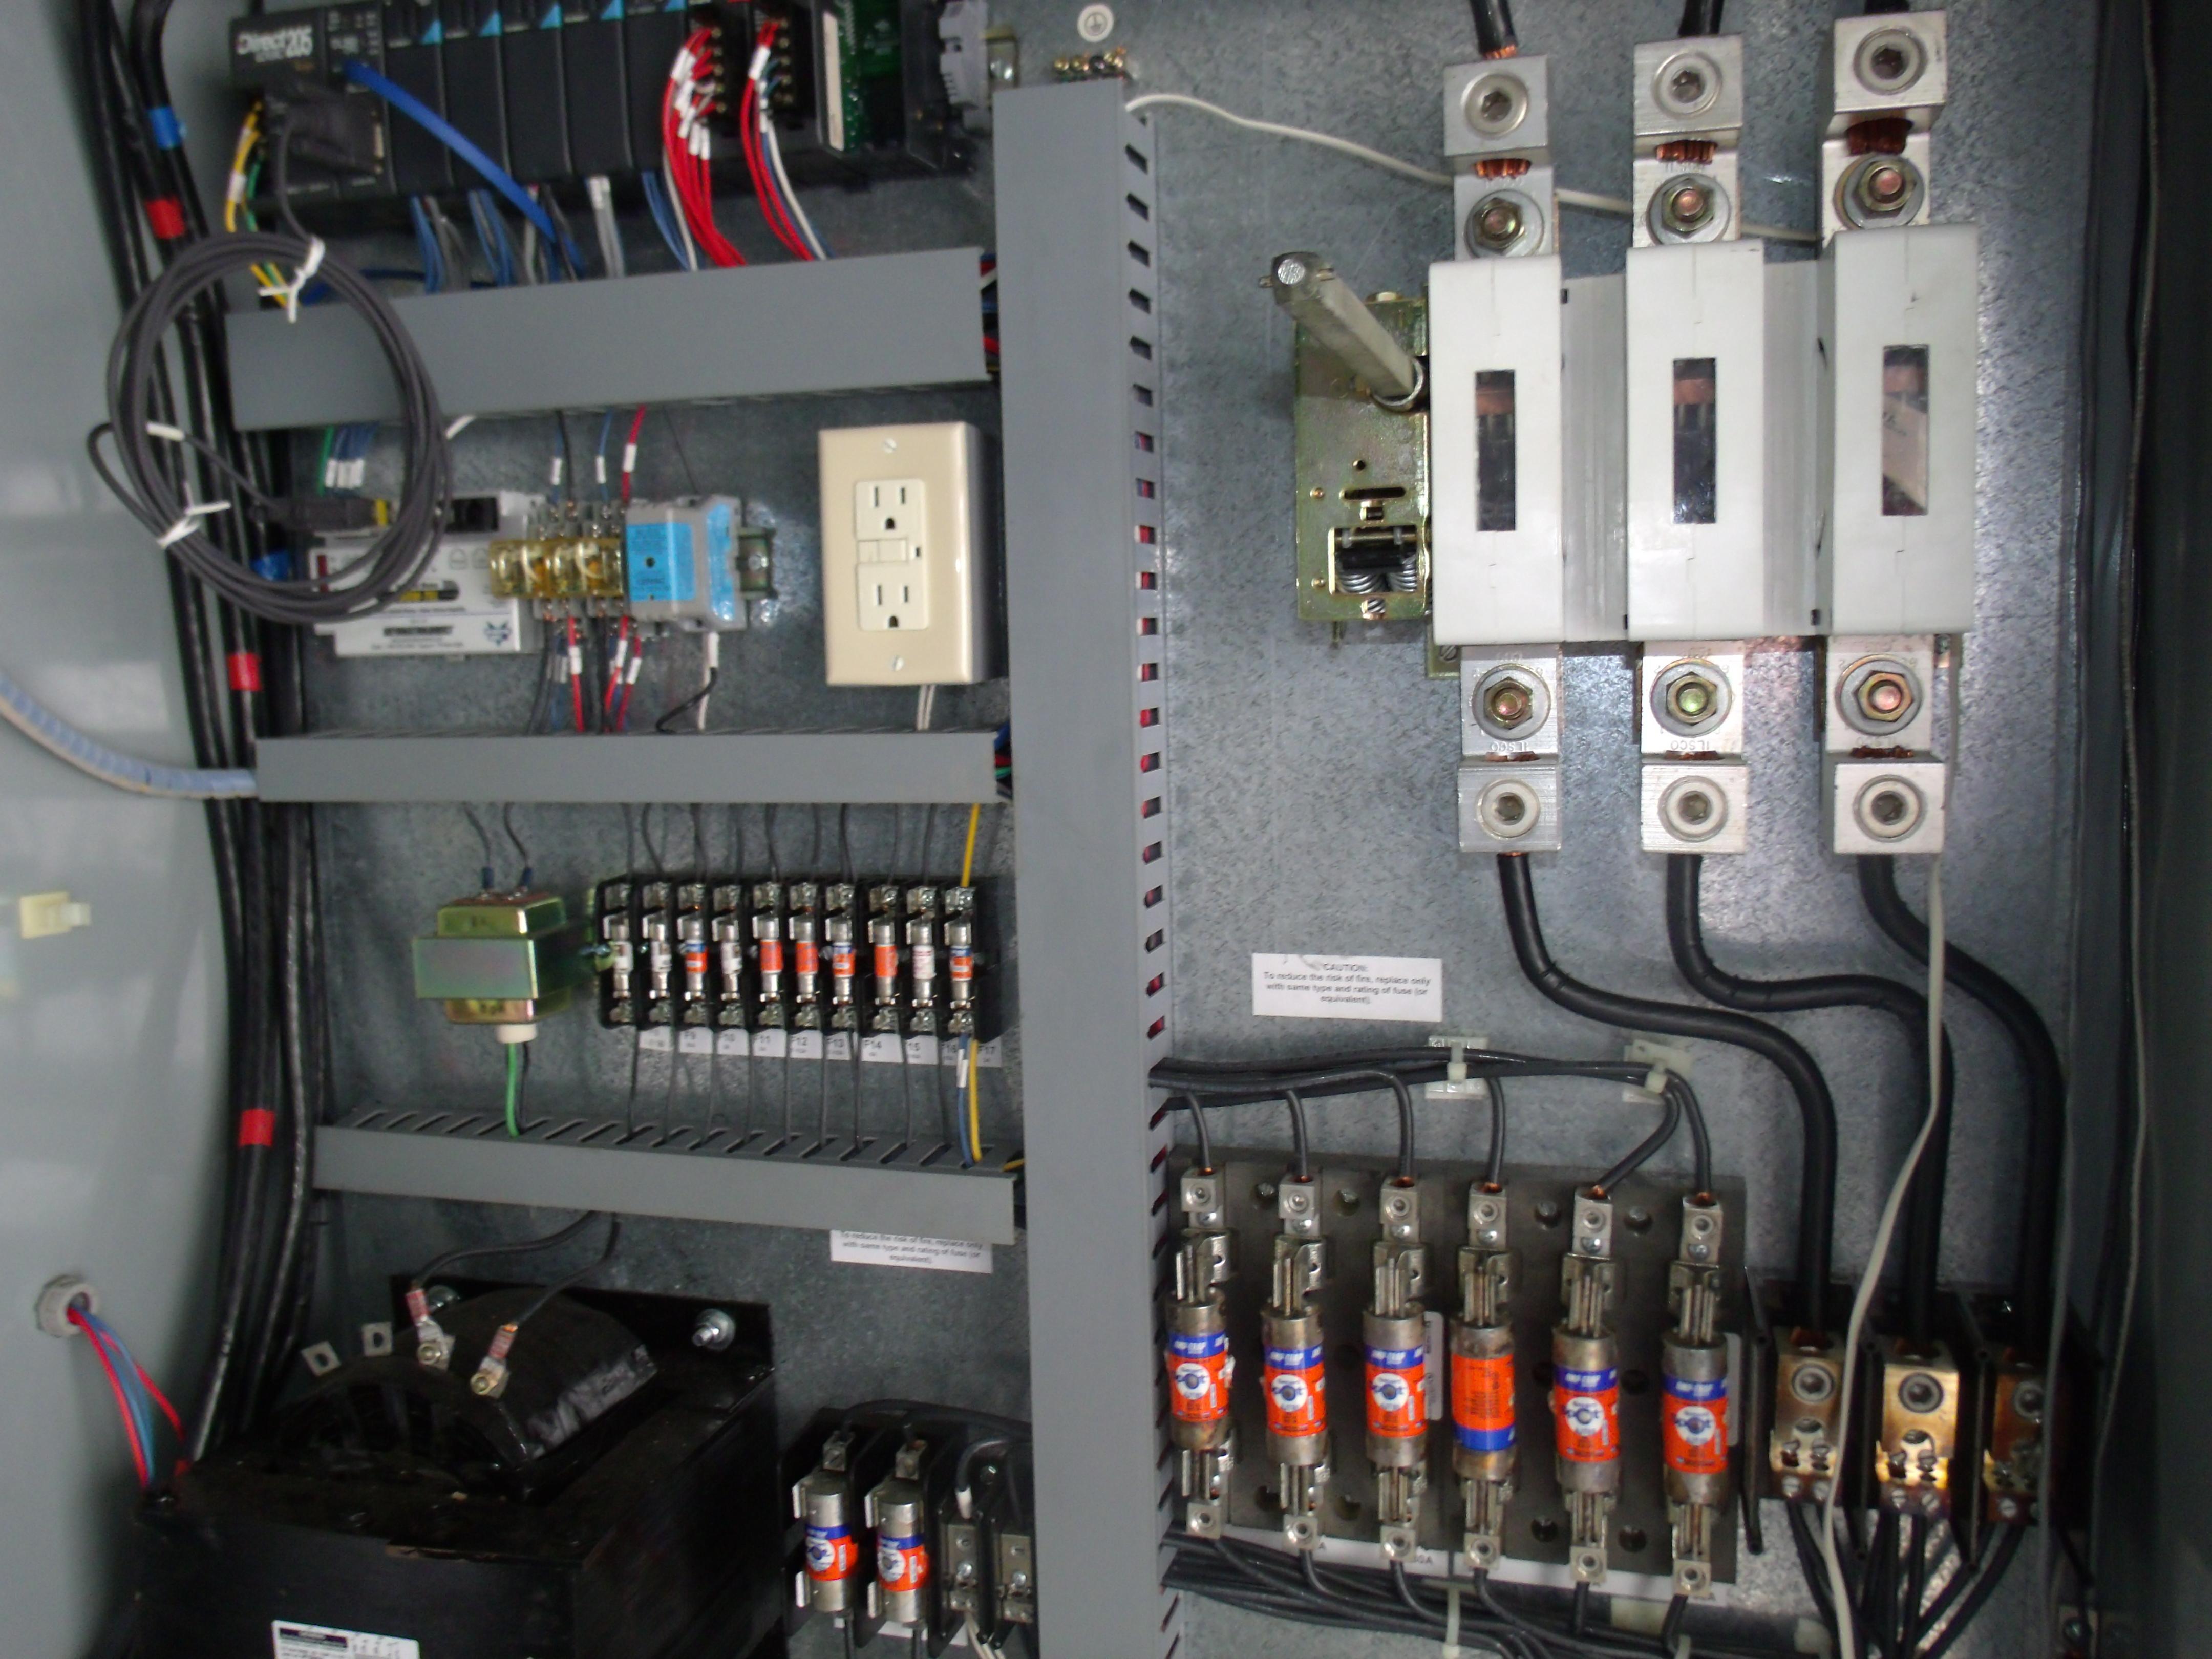 Groß Electric Panels Galerie - Verdrahtungsideen - korsmi.info